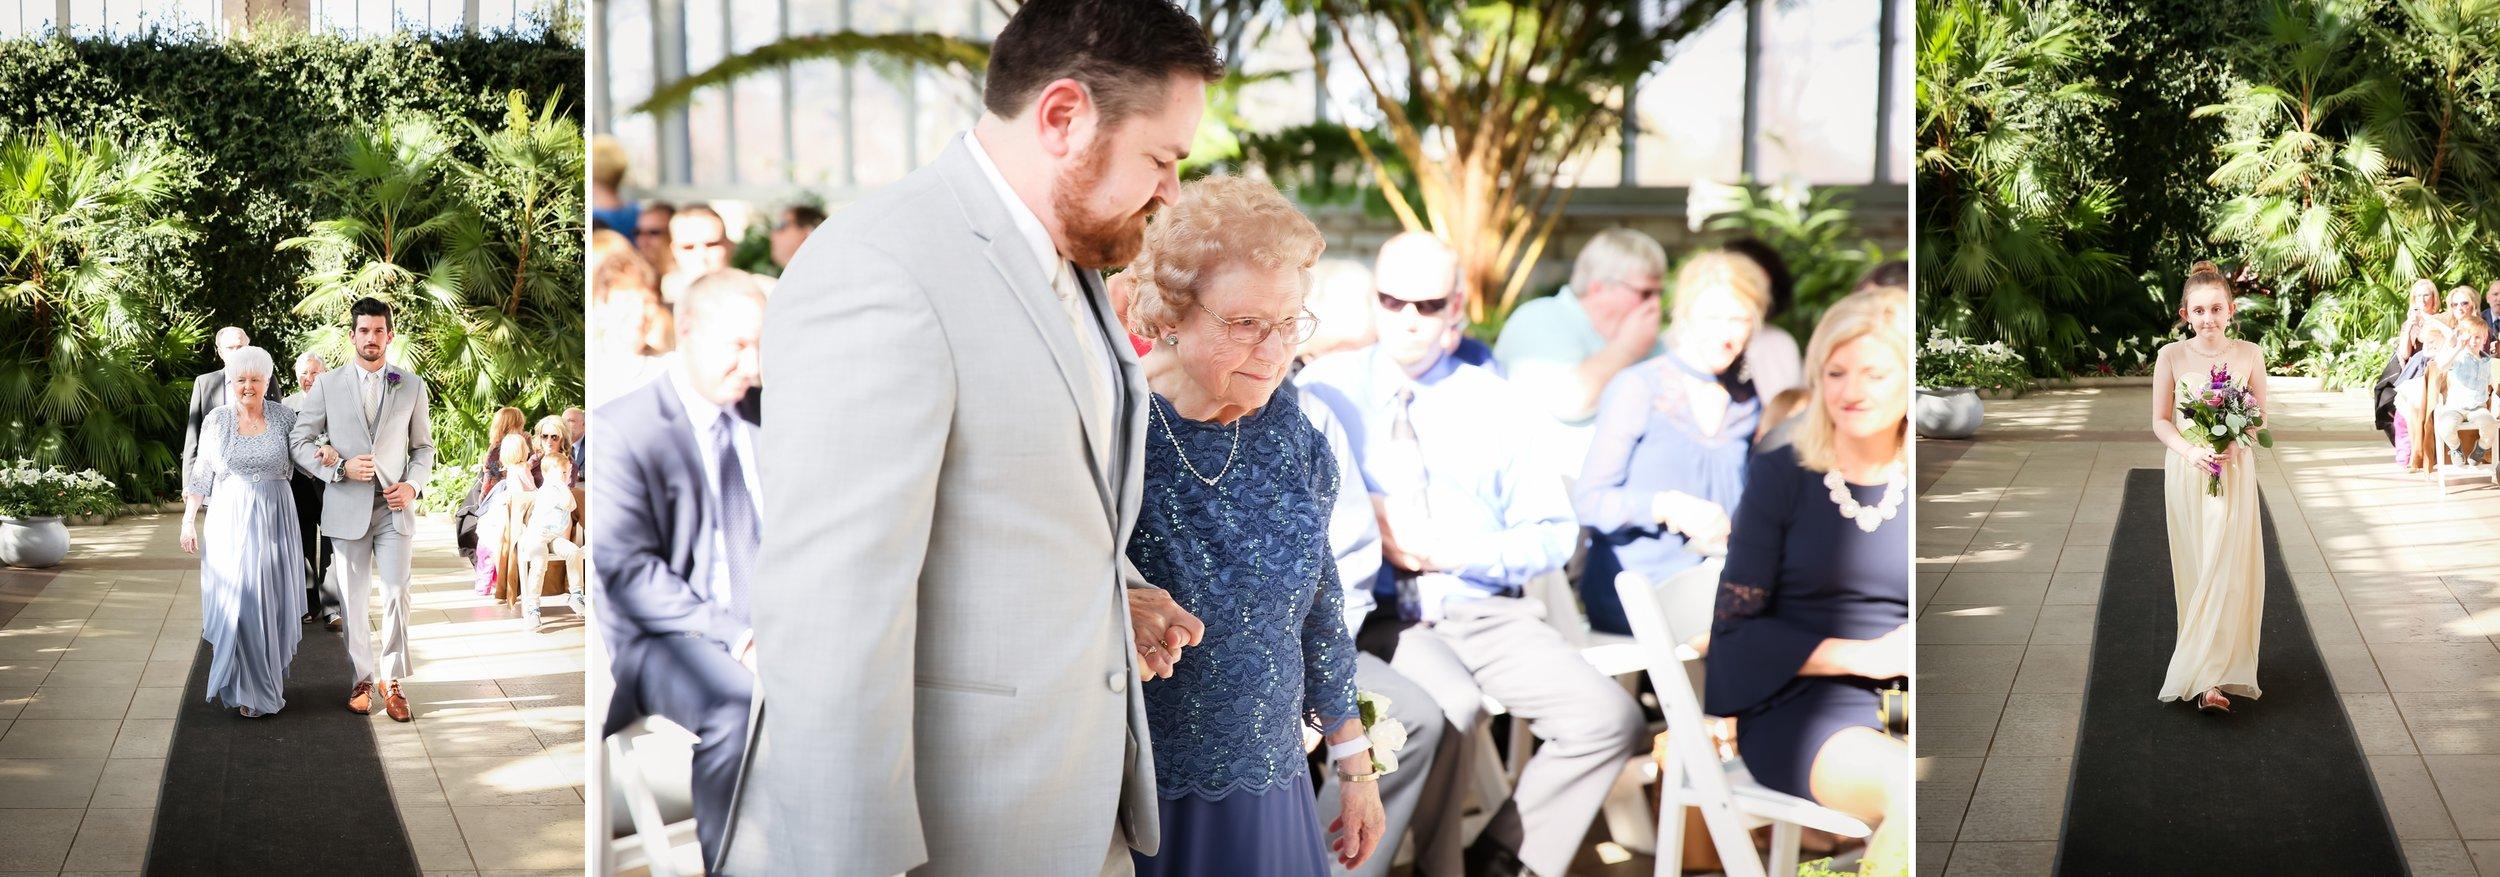 cleary wedding 27.jpg